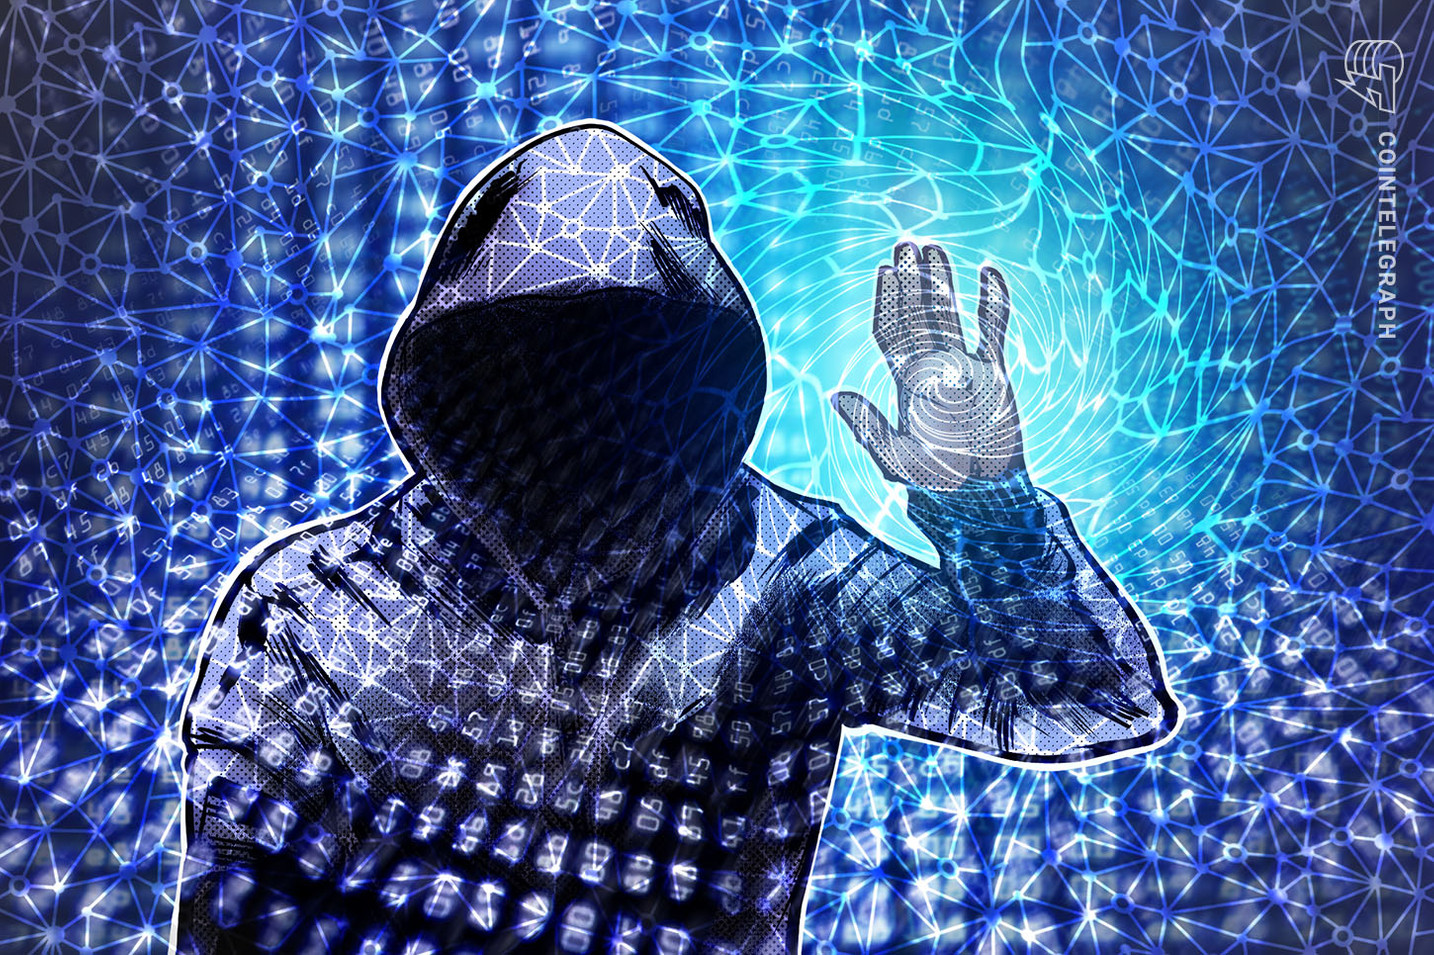 Un ingeniero nuclear vende datos clasificados a agentes encubiertos del FBI a cambio de criptomonedas